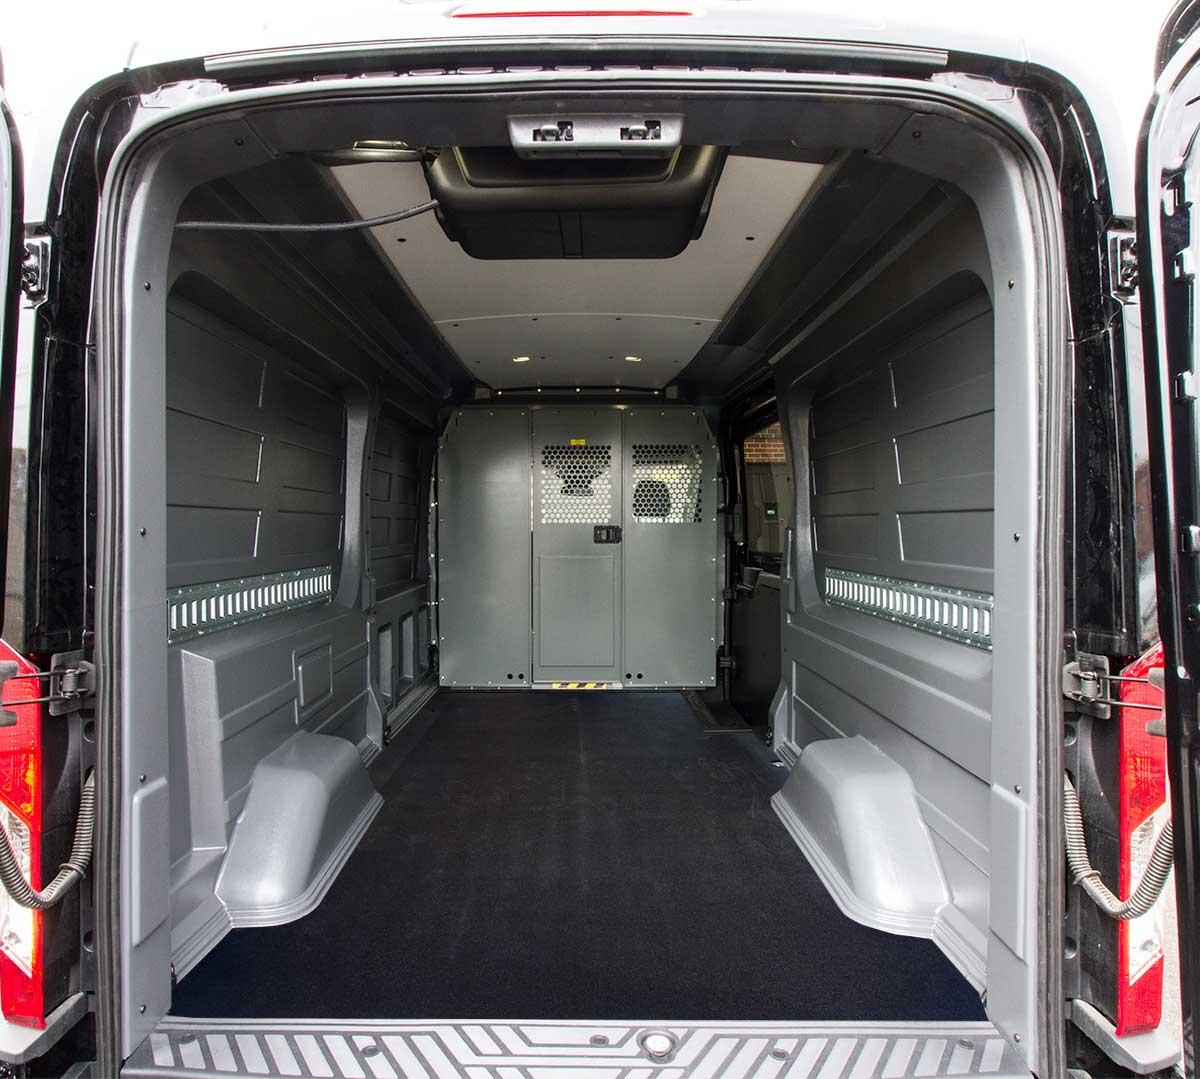 2015 Ford Transit 150 Wagon Interior: Ford Transit Rear Cargo HVAC Solutions By Cicioni